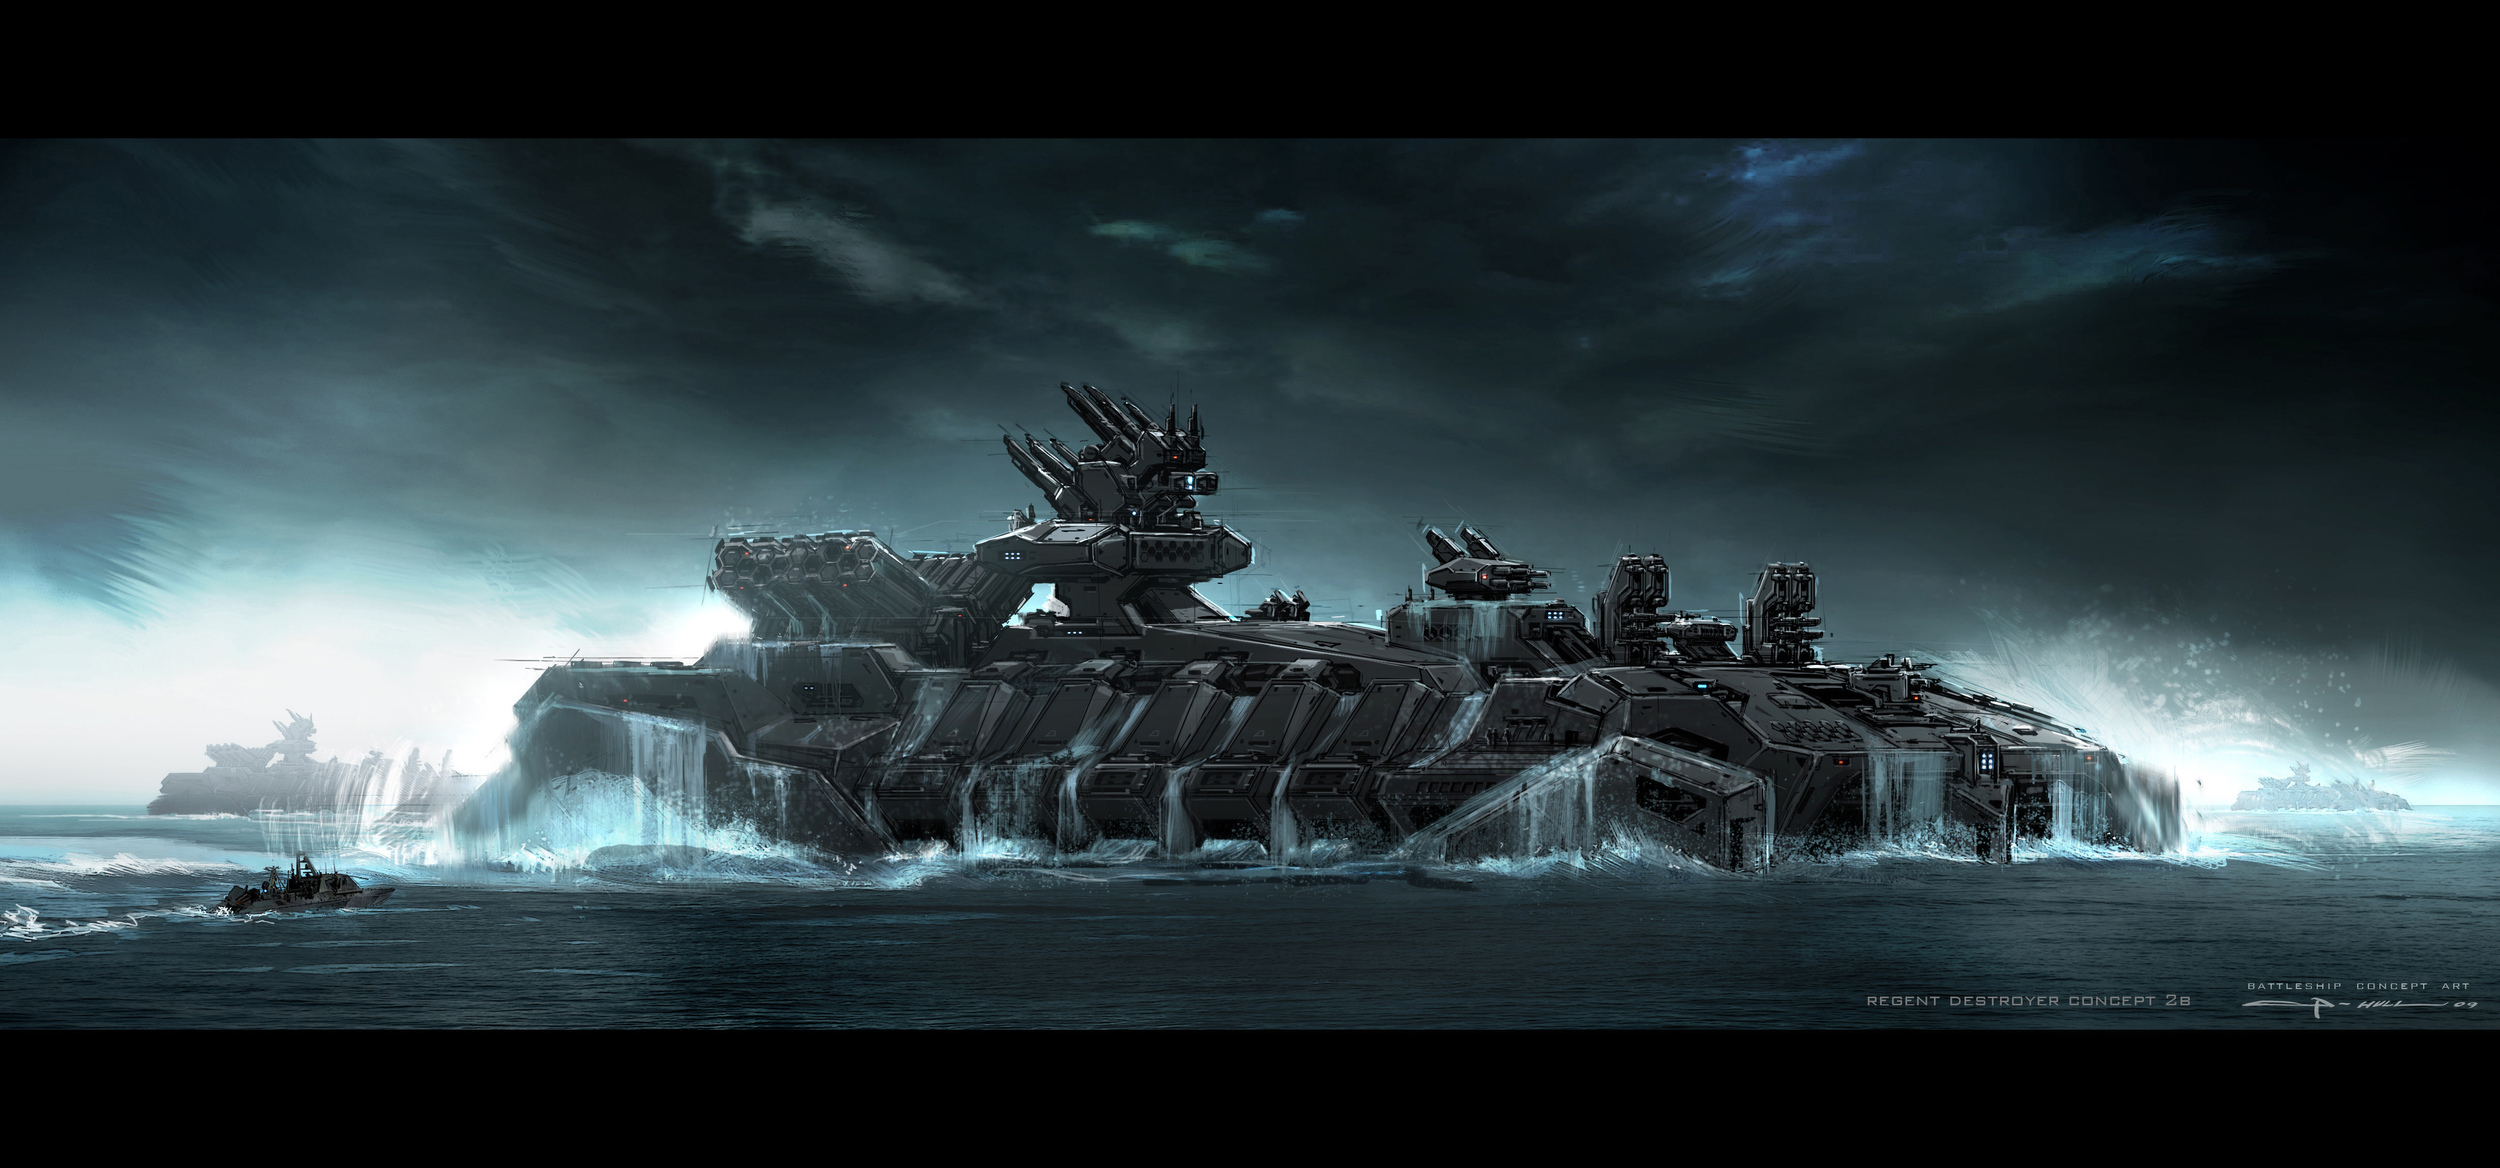 battleship11_Sketch2Dwater_ghull.jpg